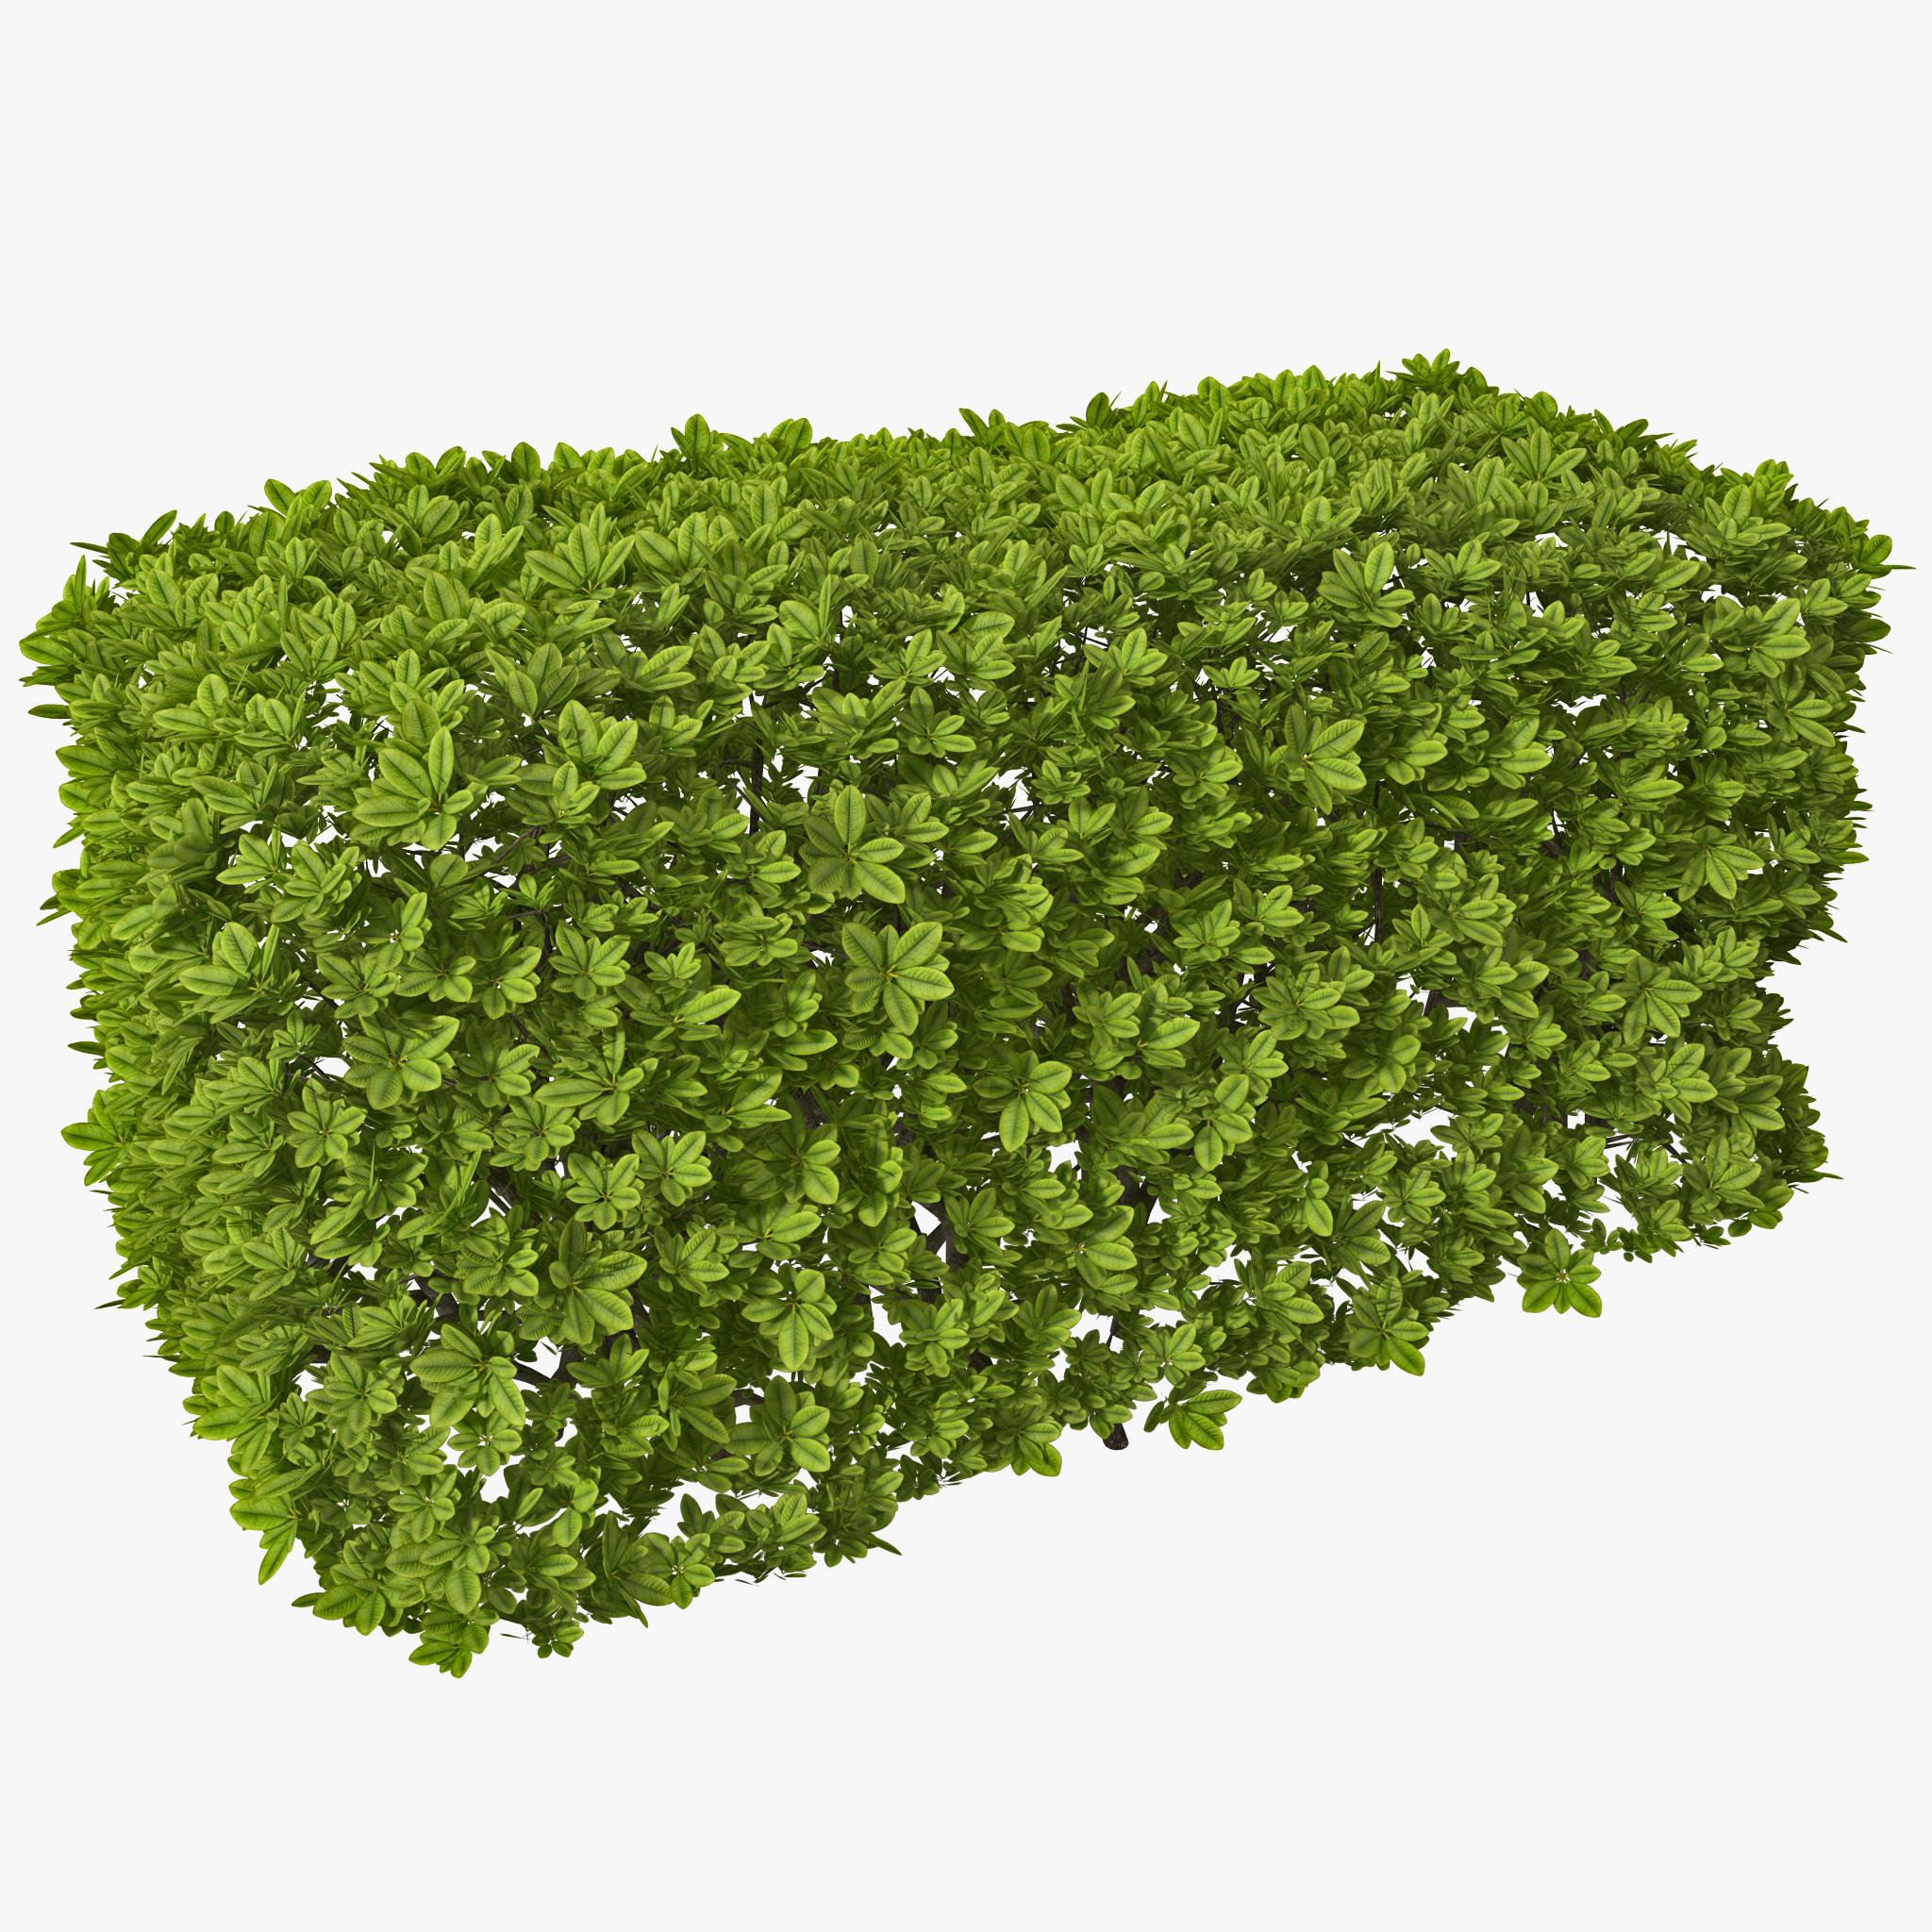 Boxes Plant Png   Google Search - Shrub Bushes, Transparent background PNG HD thumbnail